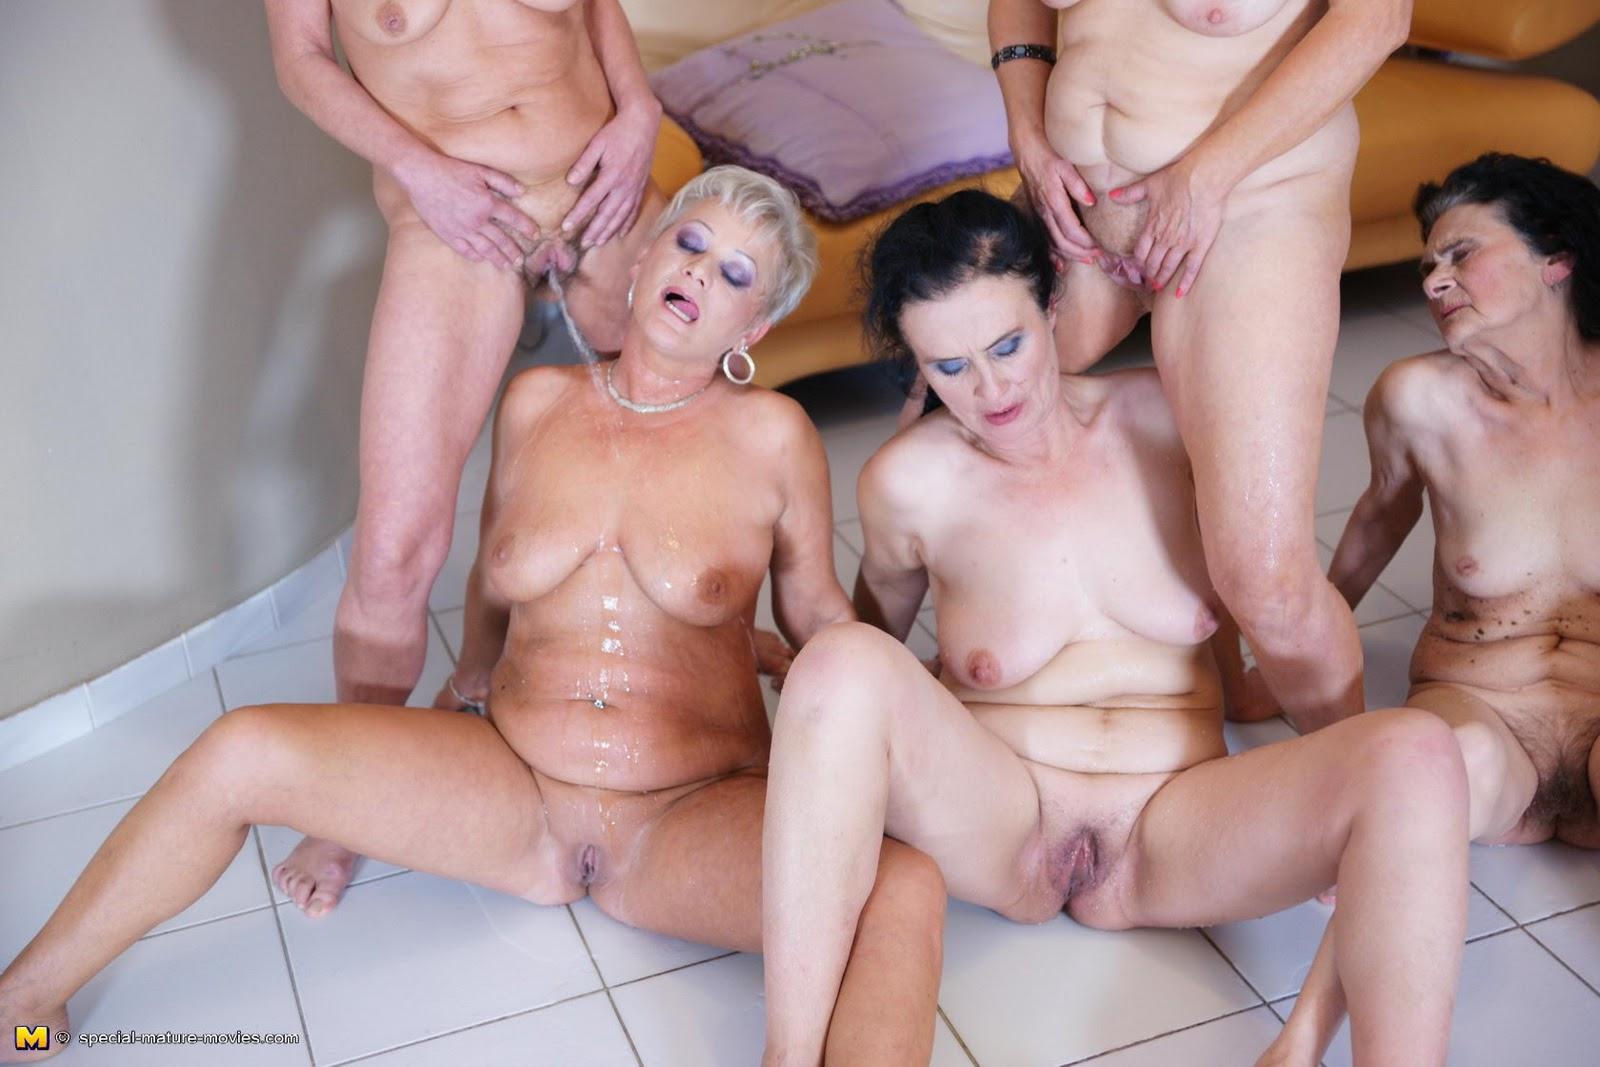 smotret-gruppovoe-porno-zolotoy-dozhd